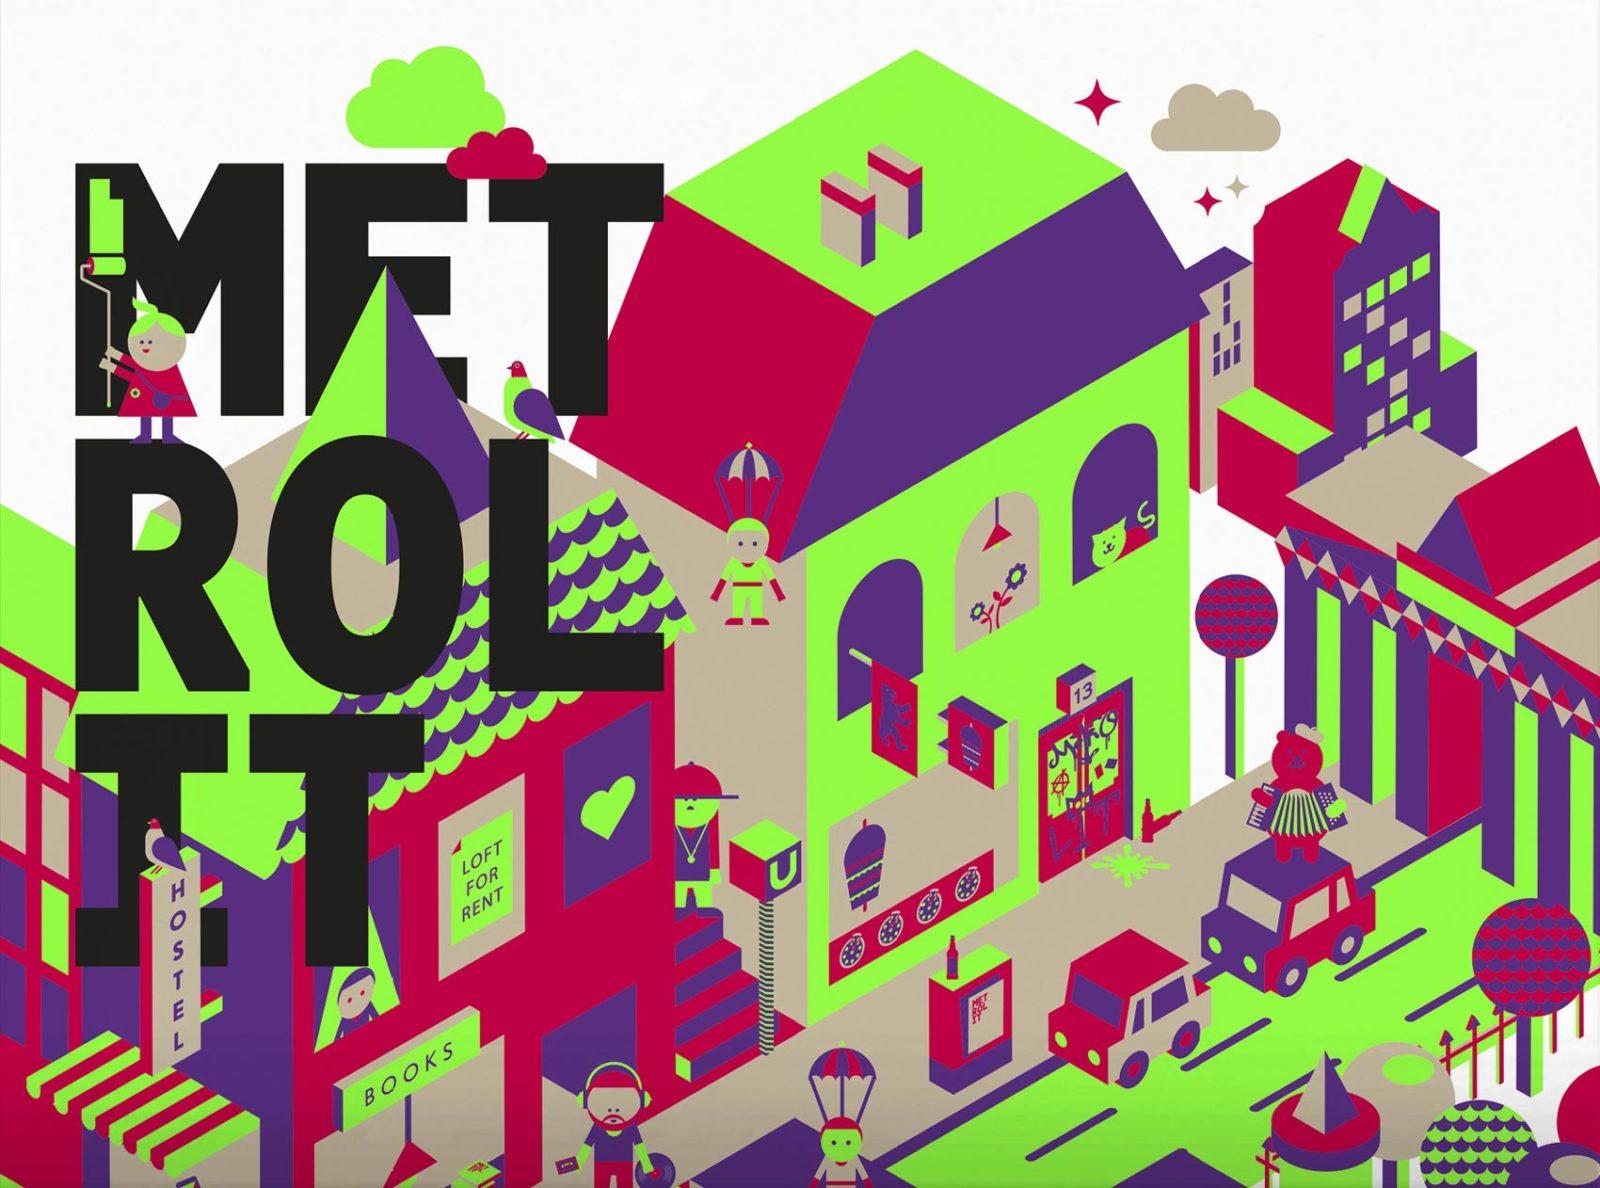 Editienne Grafikdesign - Kommunikationsdesign Berlin- Editorial Design Verlagskommunikation 24